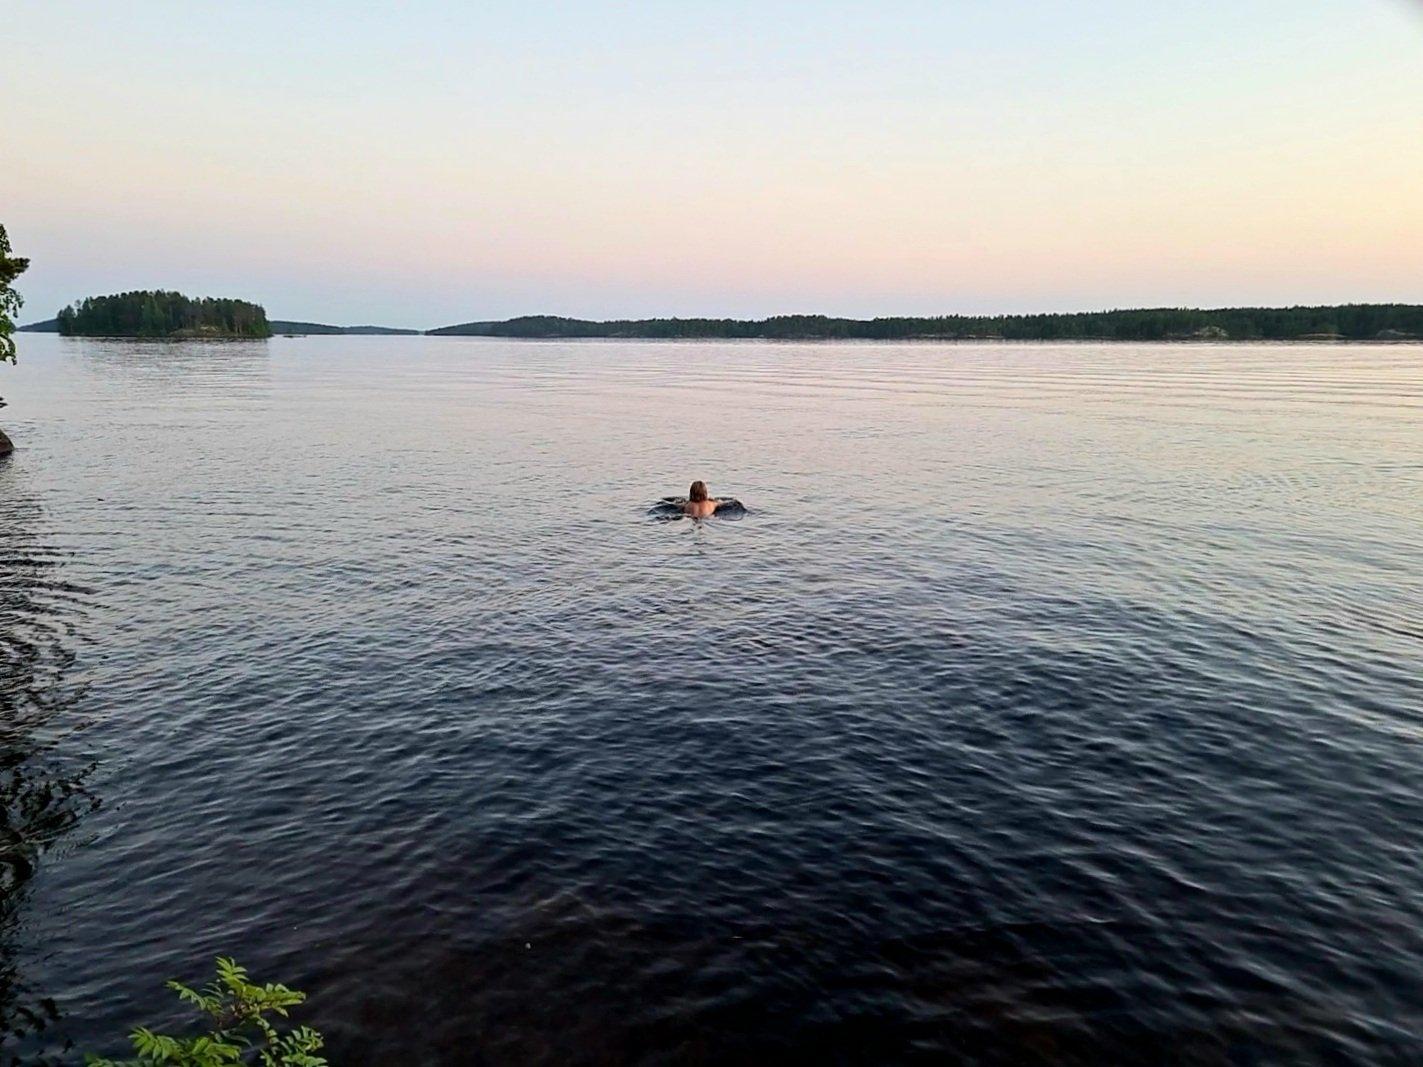 uimari saimaalla